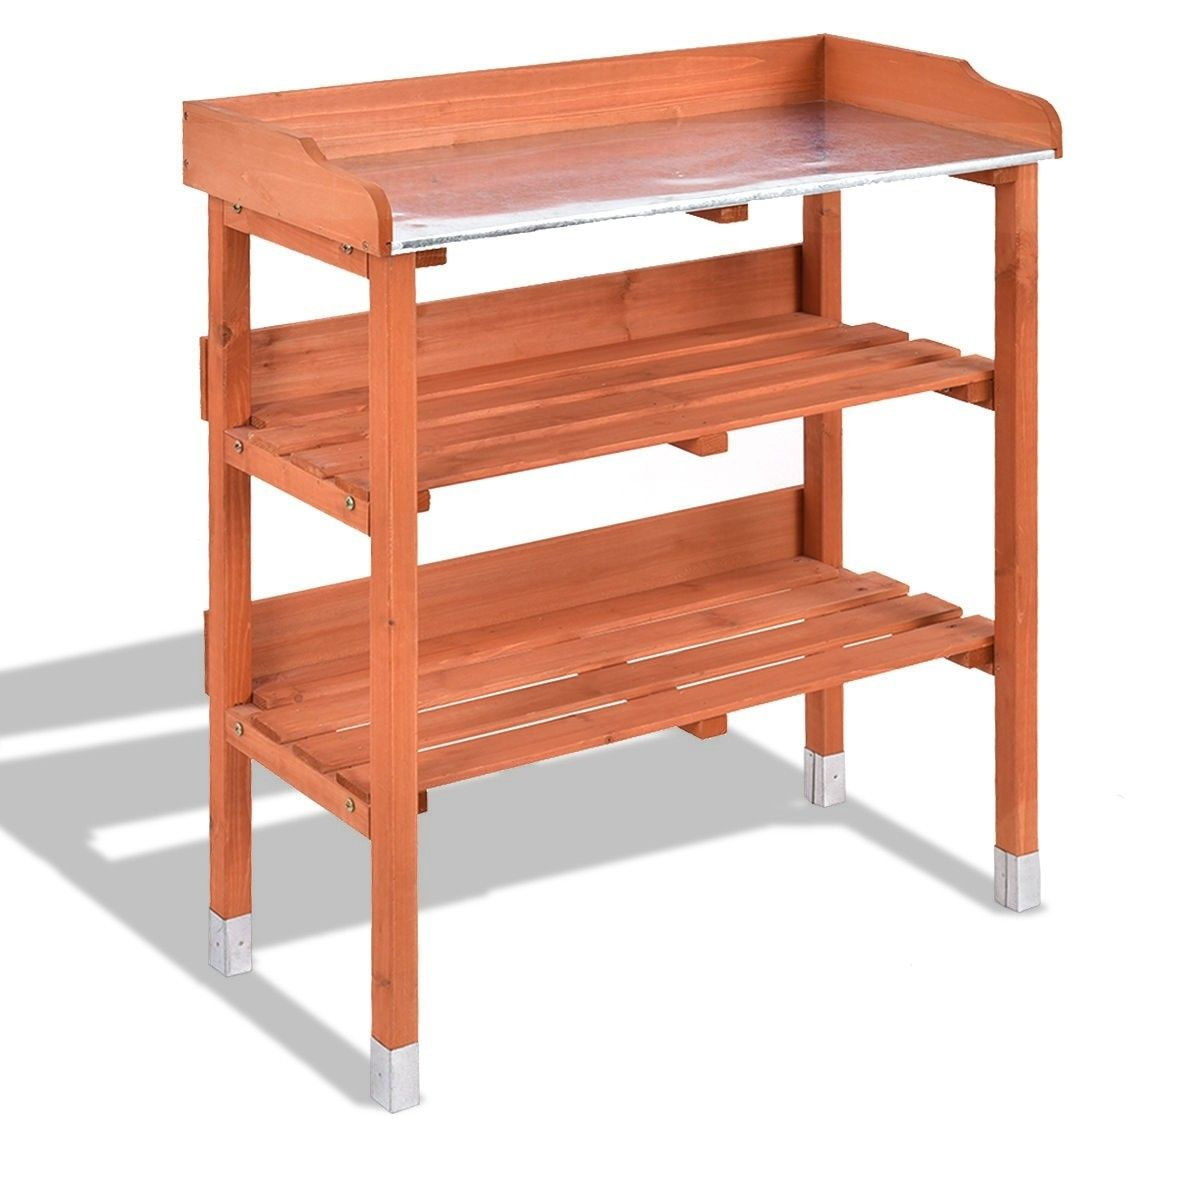 Garden Wooden Potting Bench Work Station With Hook Potting Bench Garden Tool Storage Furniture